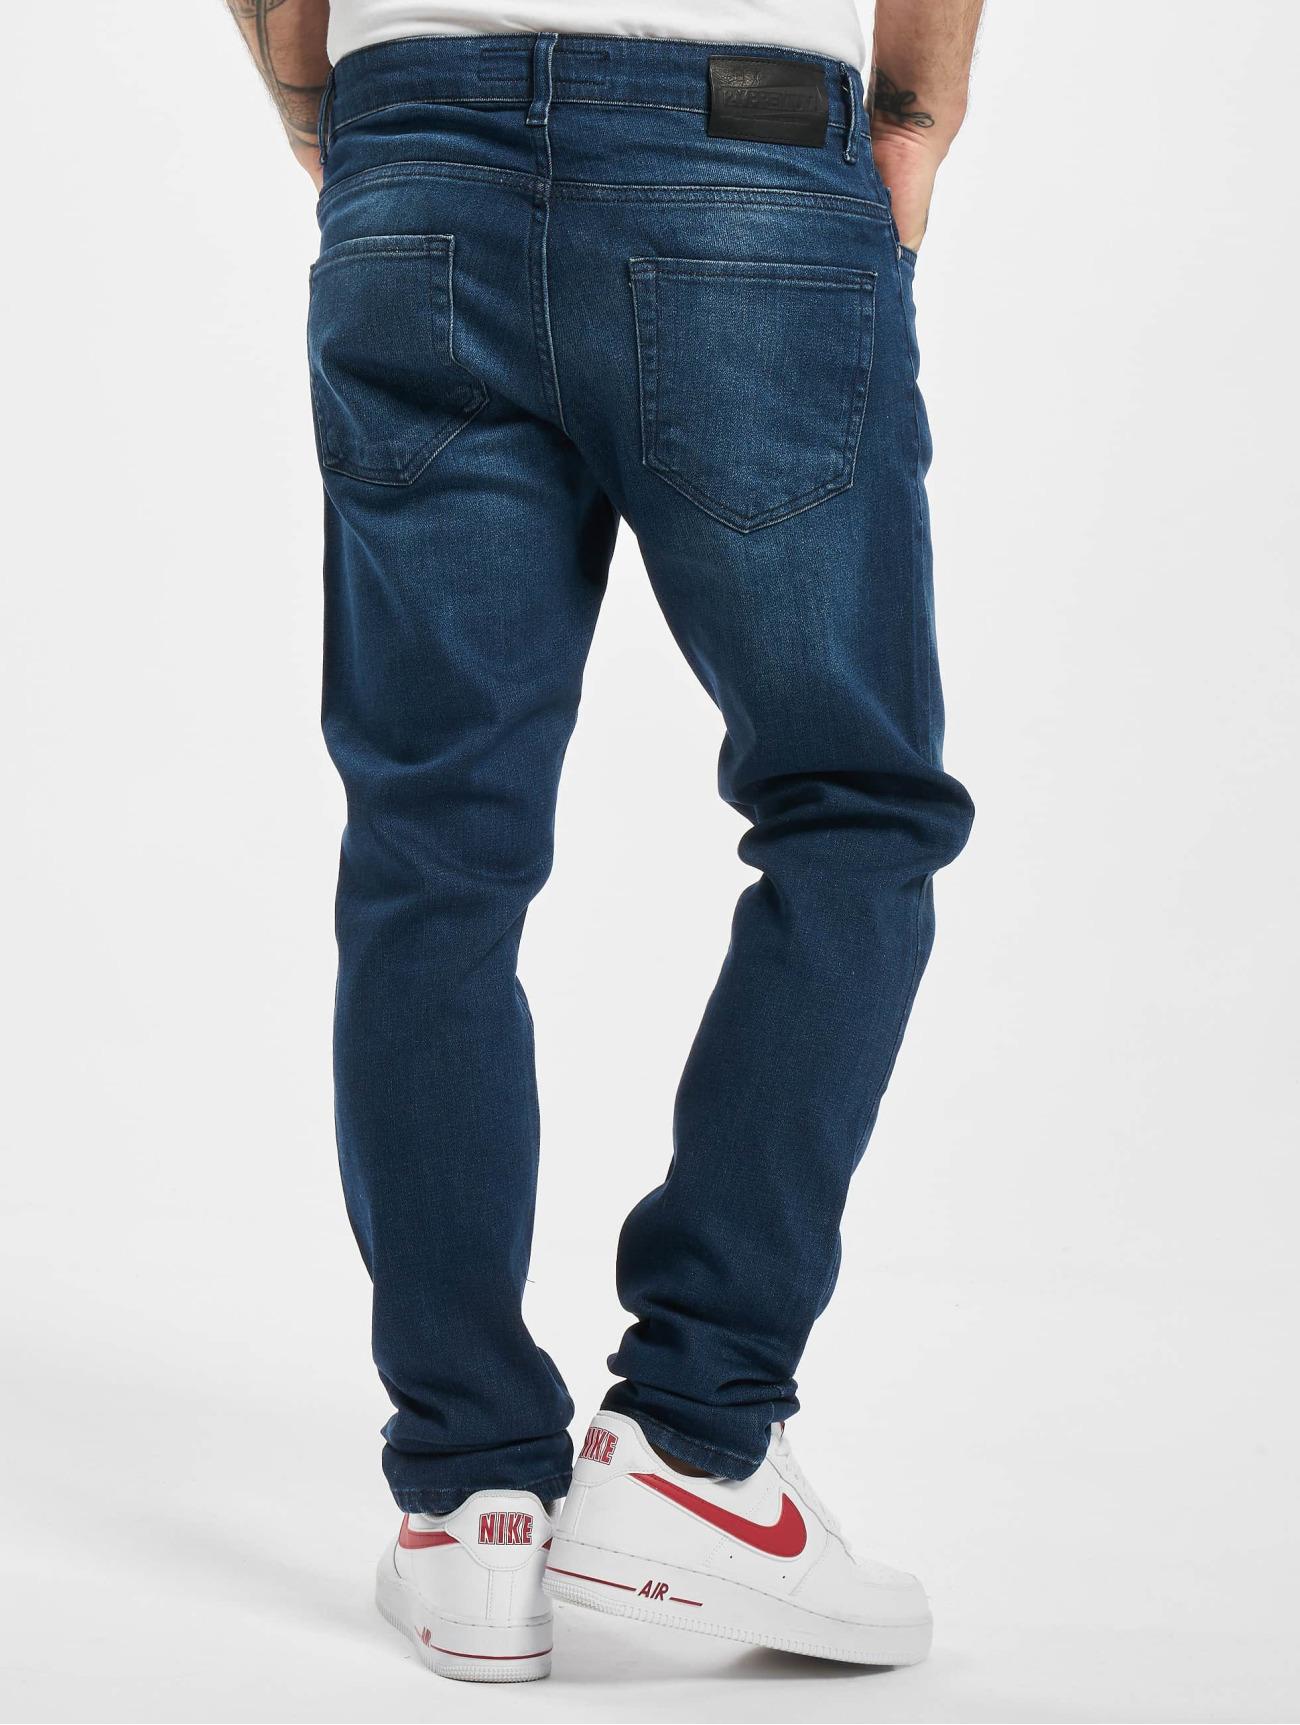 2Y Jeans / Slim Fit Jeans Sergio  i blå 765235 Män Jeans